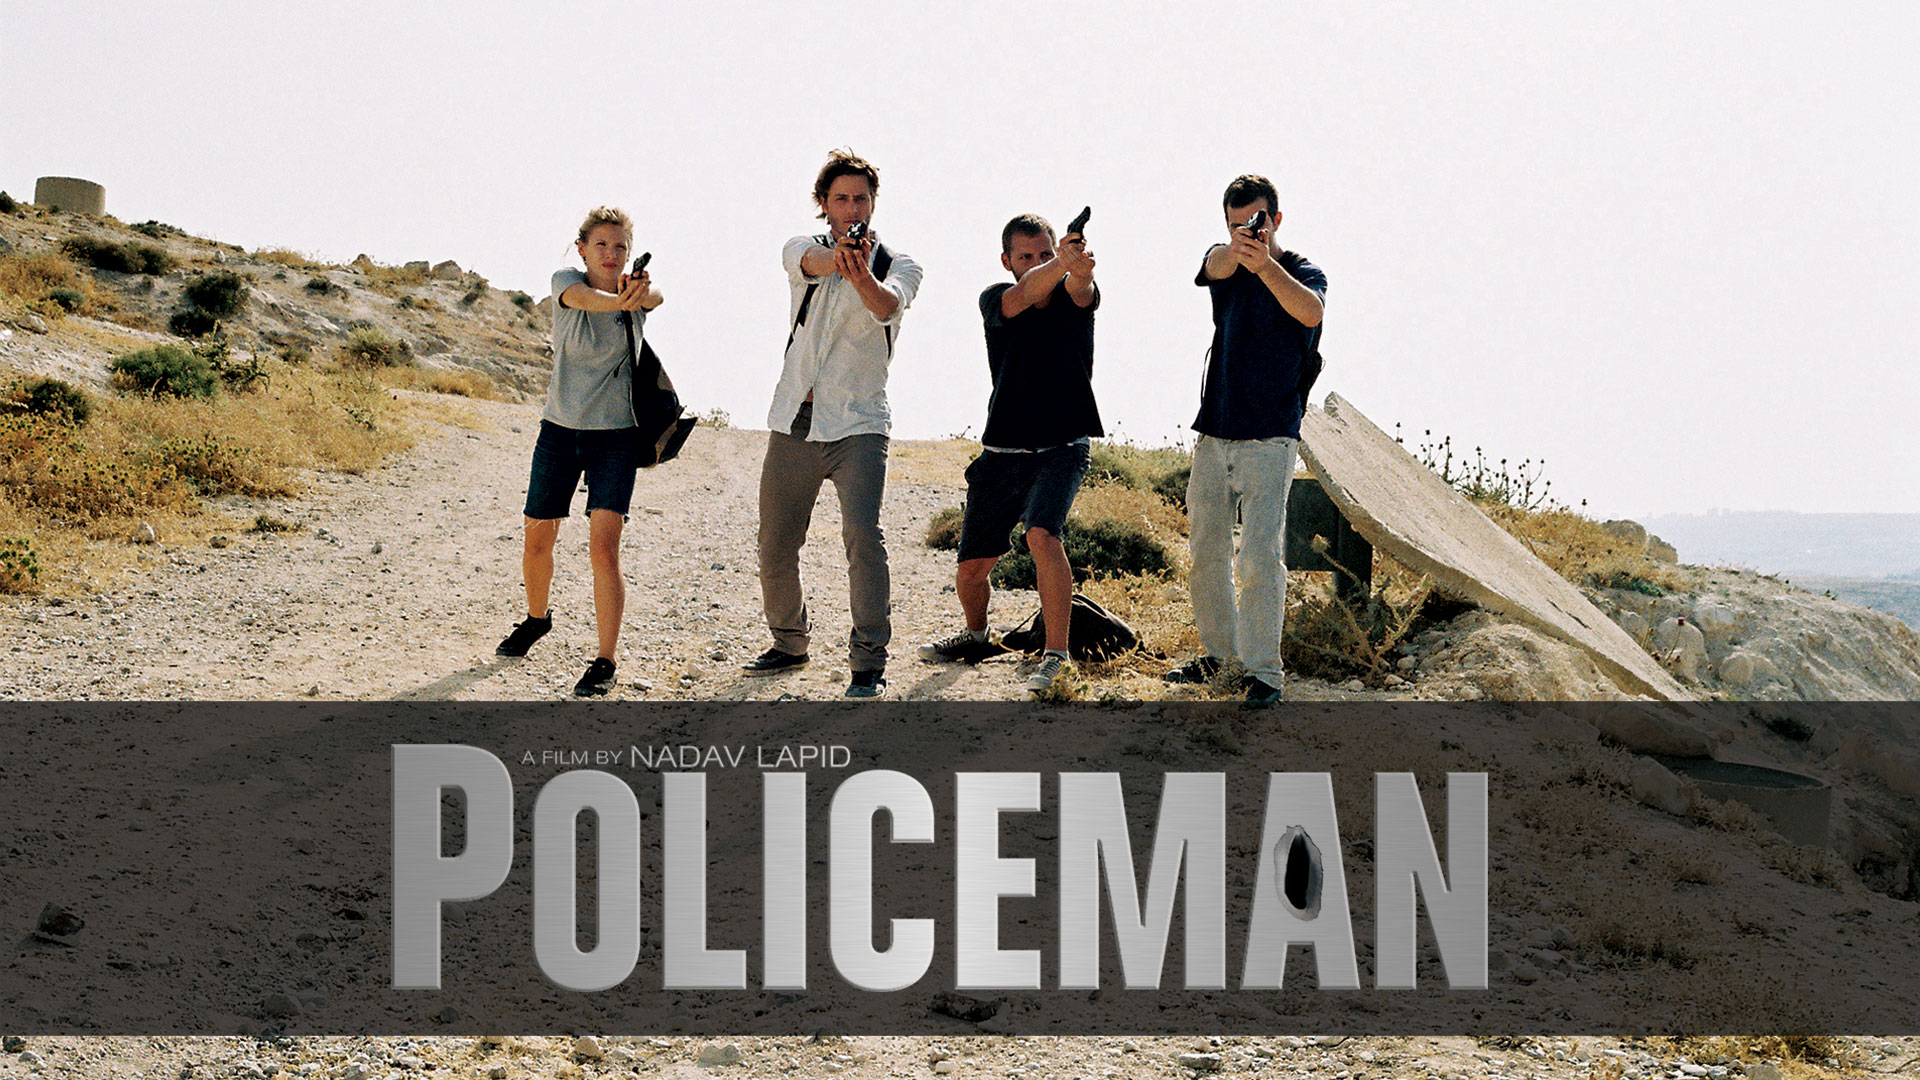 Watch Policeman on Amazon Prime Video